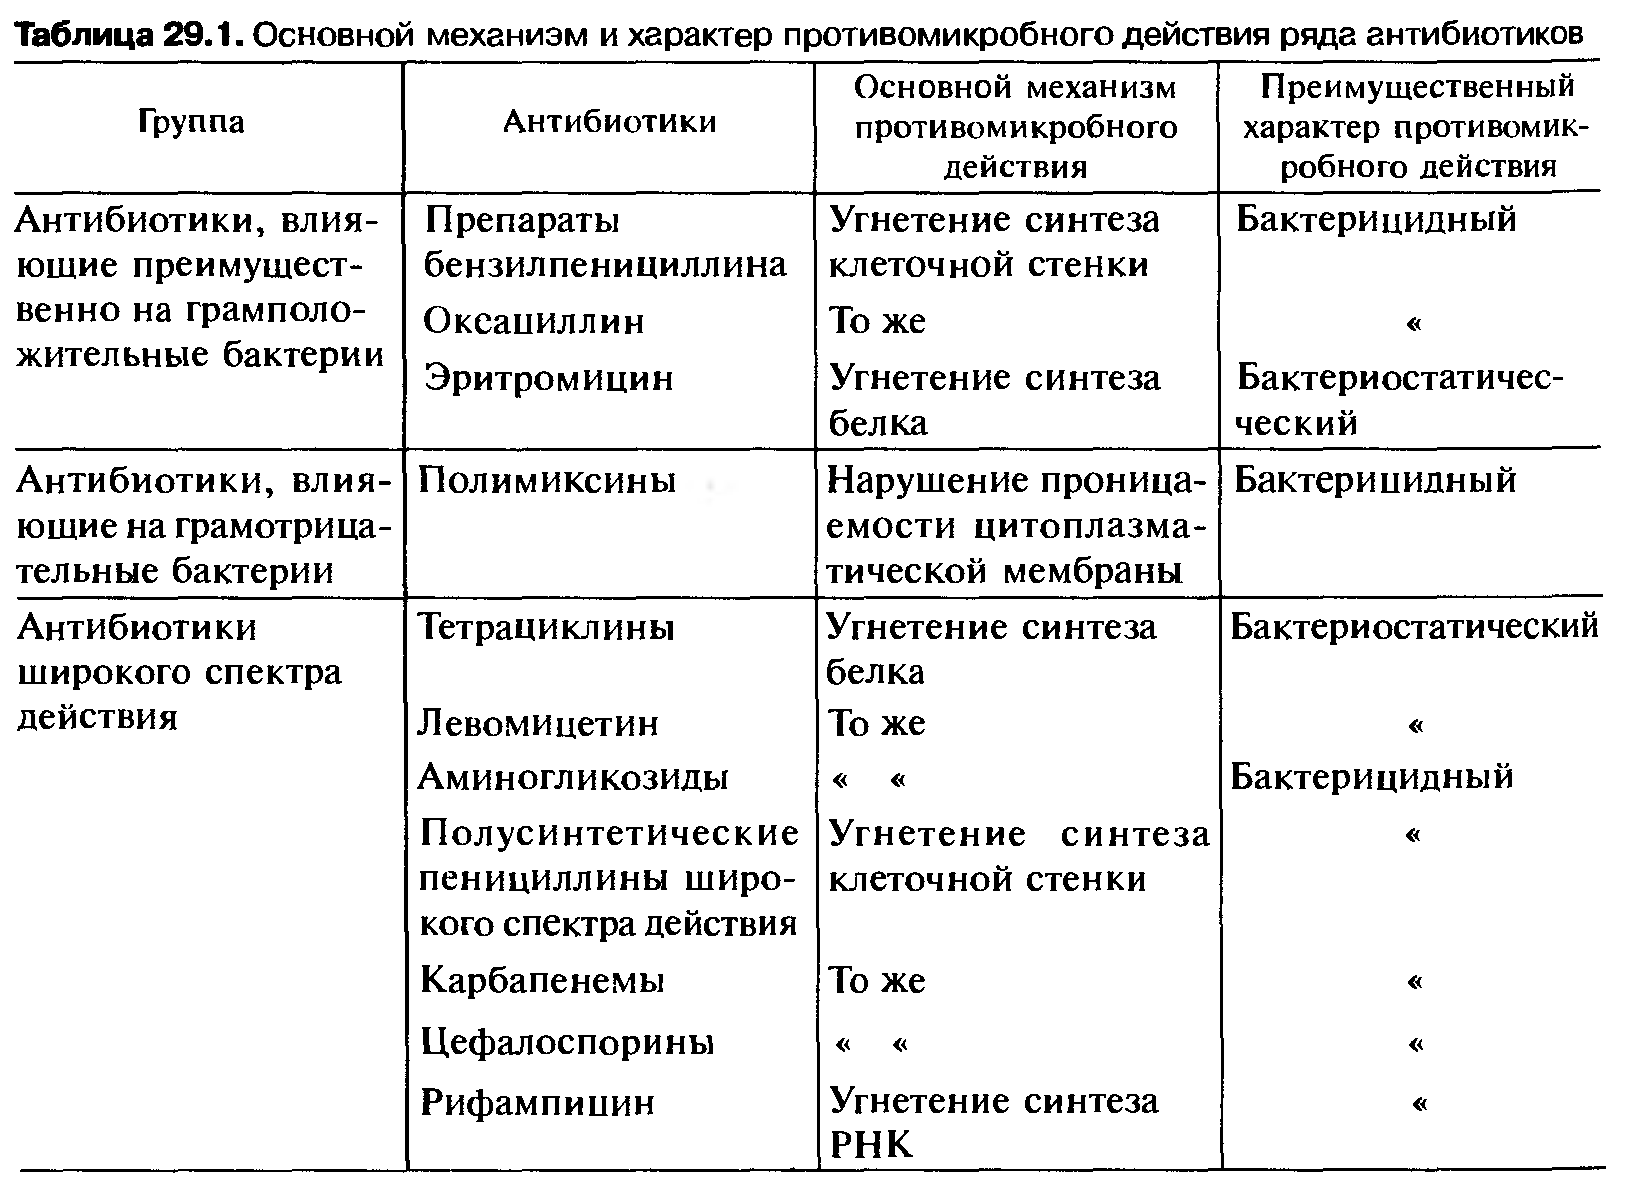 Антибиотики тетрациклинового ряда реферат 8306